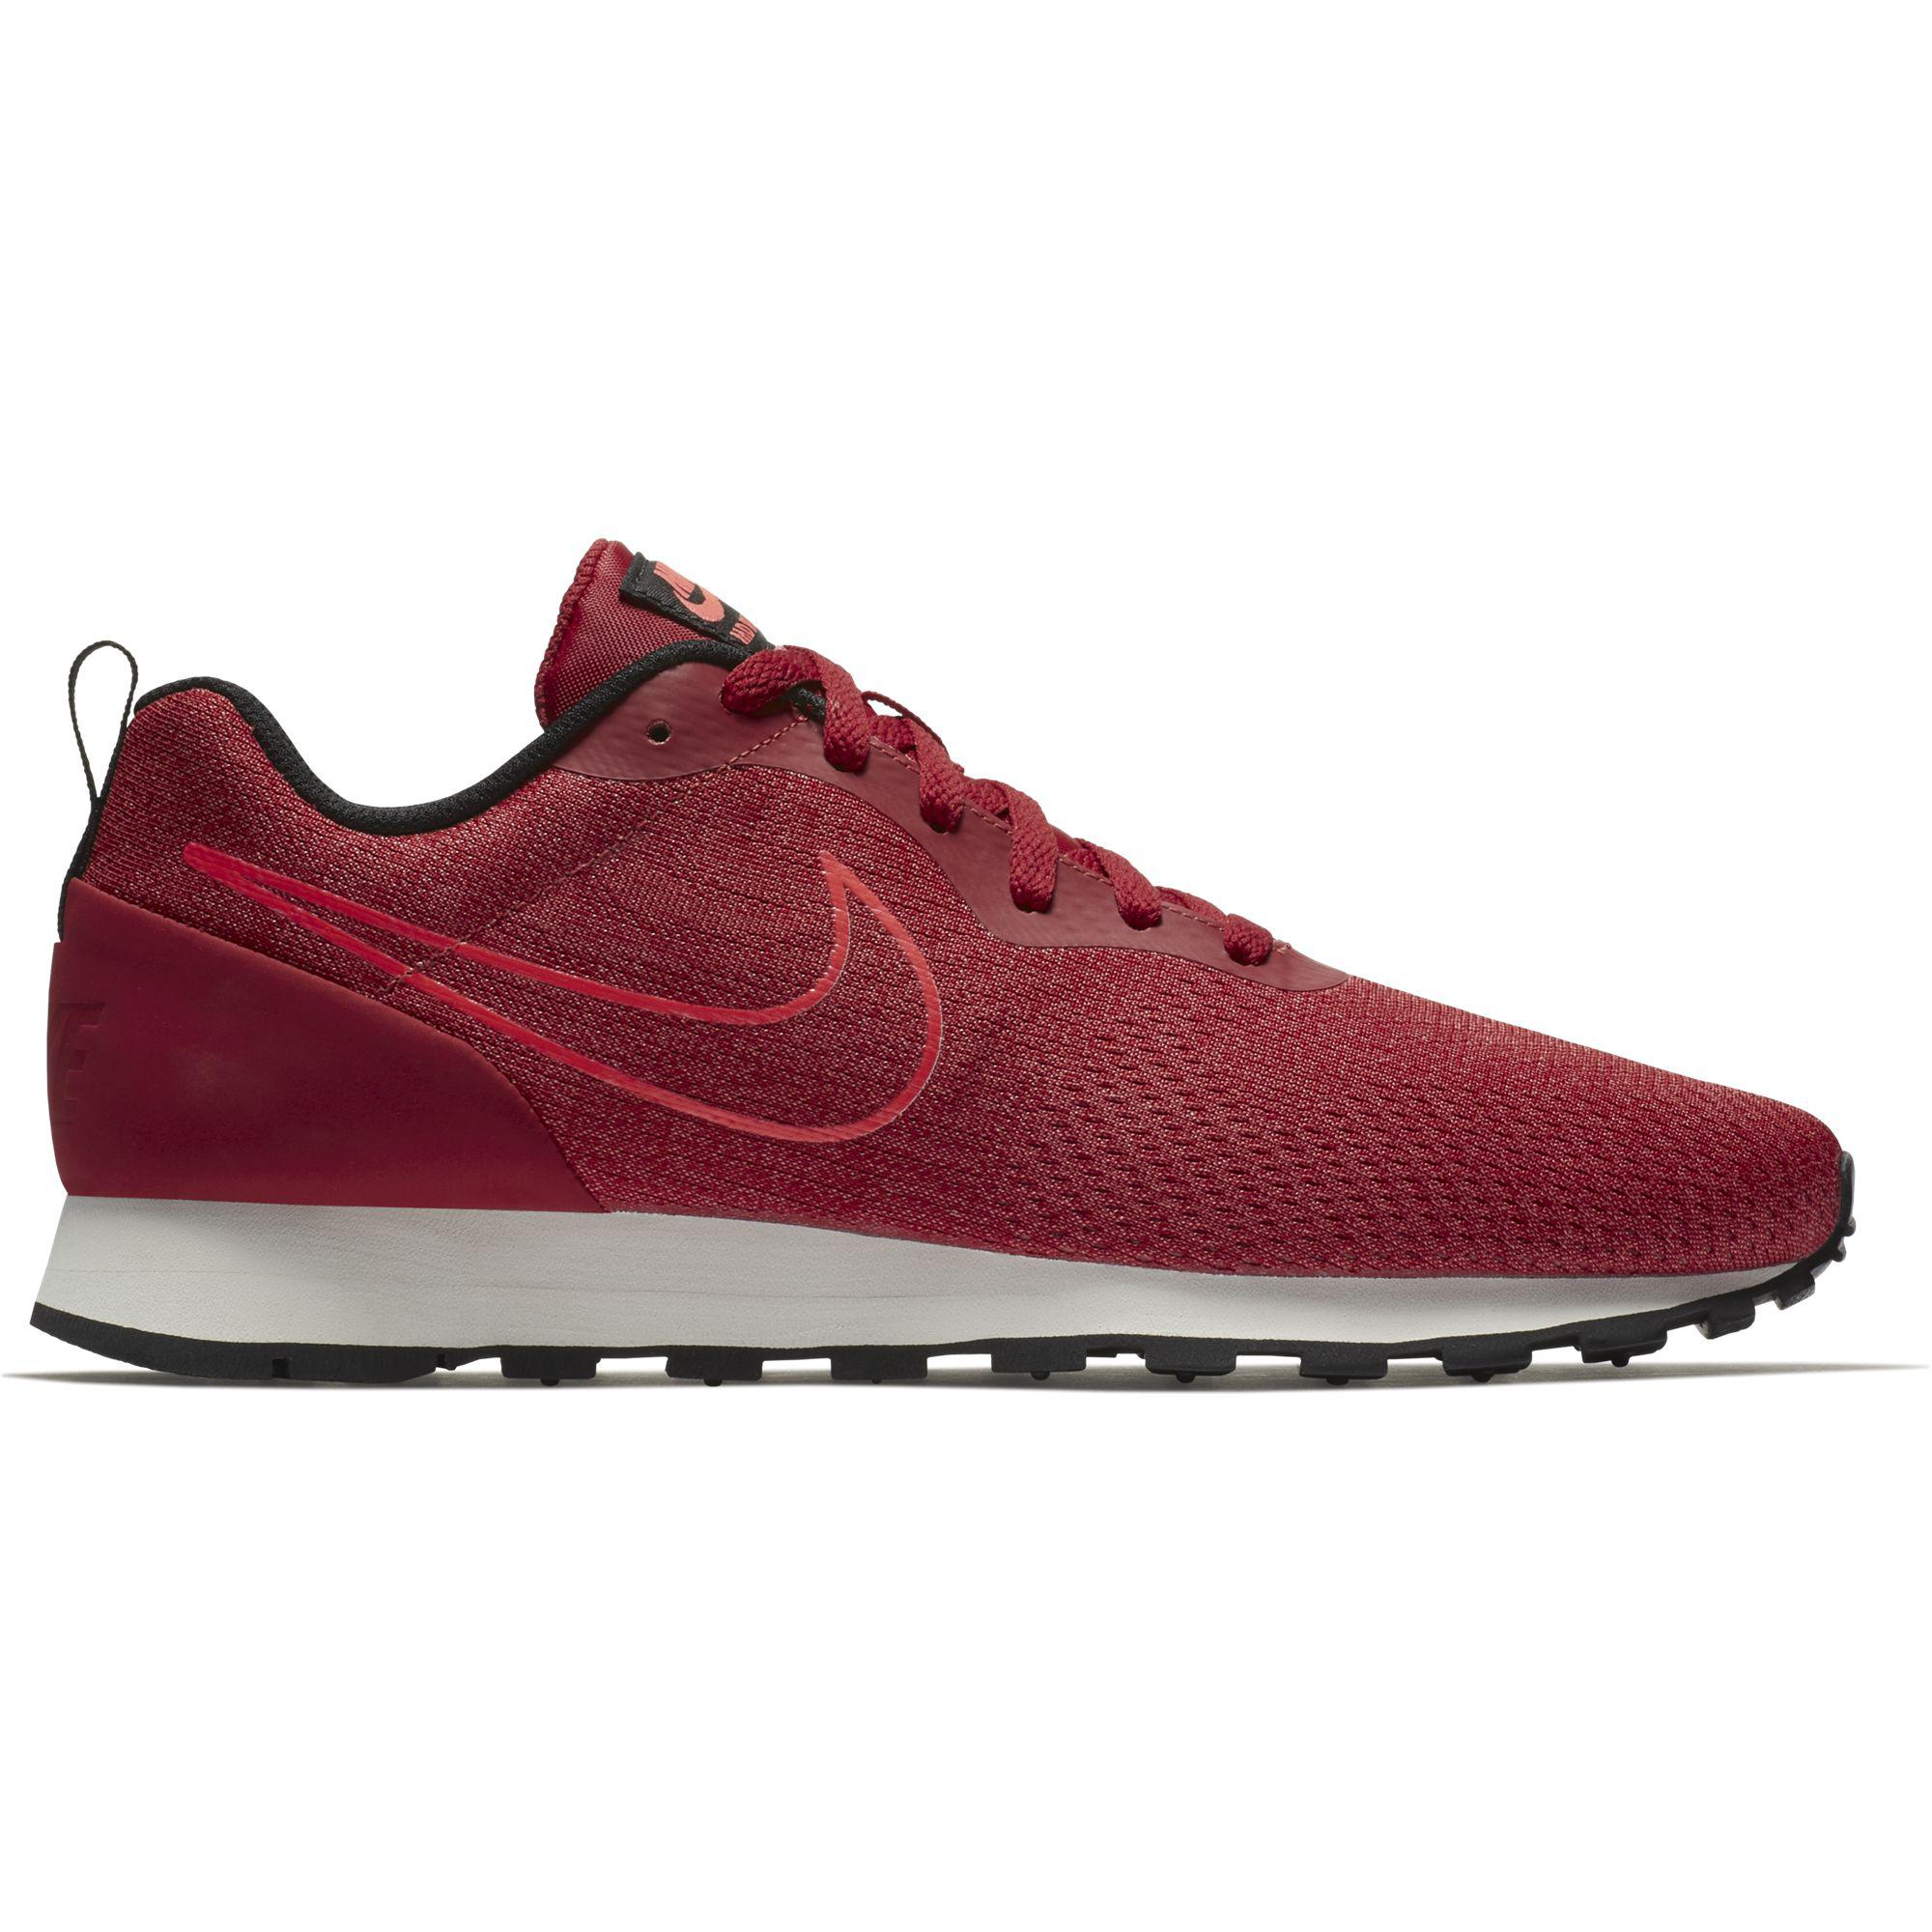 33aed9879e694 Nike Mens MD Runner 2 ENG Mesh Running Shoes - Gym Red - Tennisnuts.com